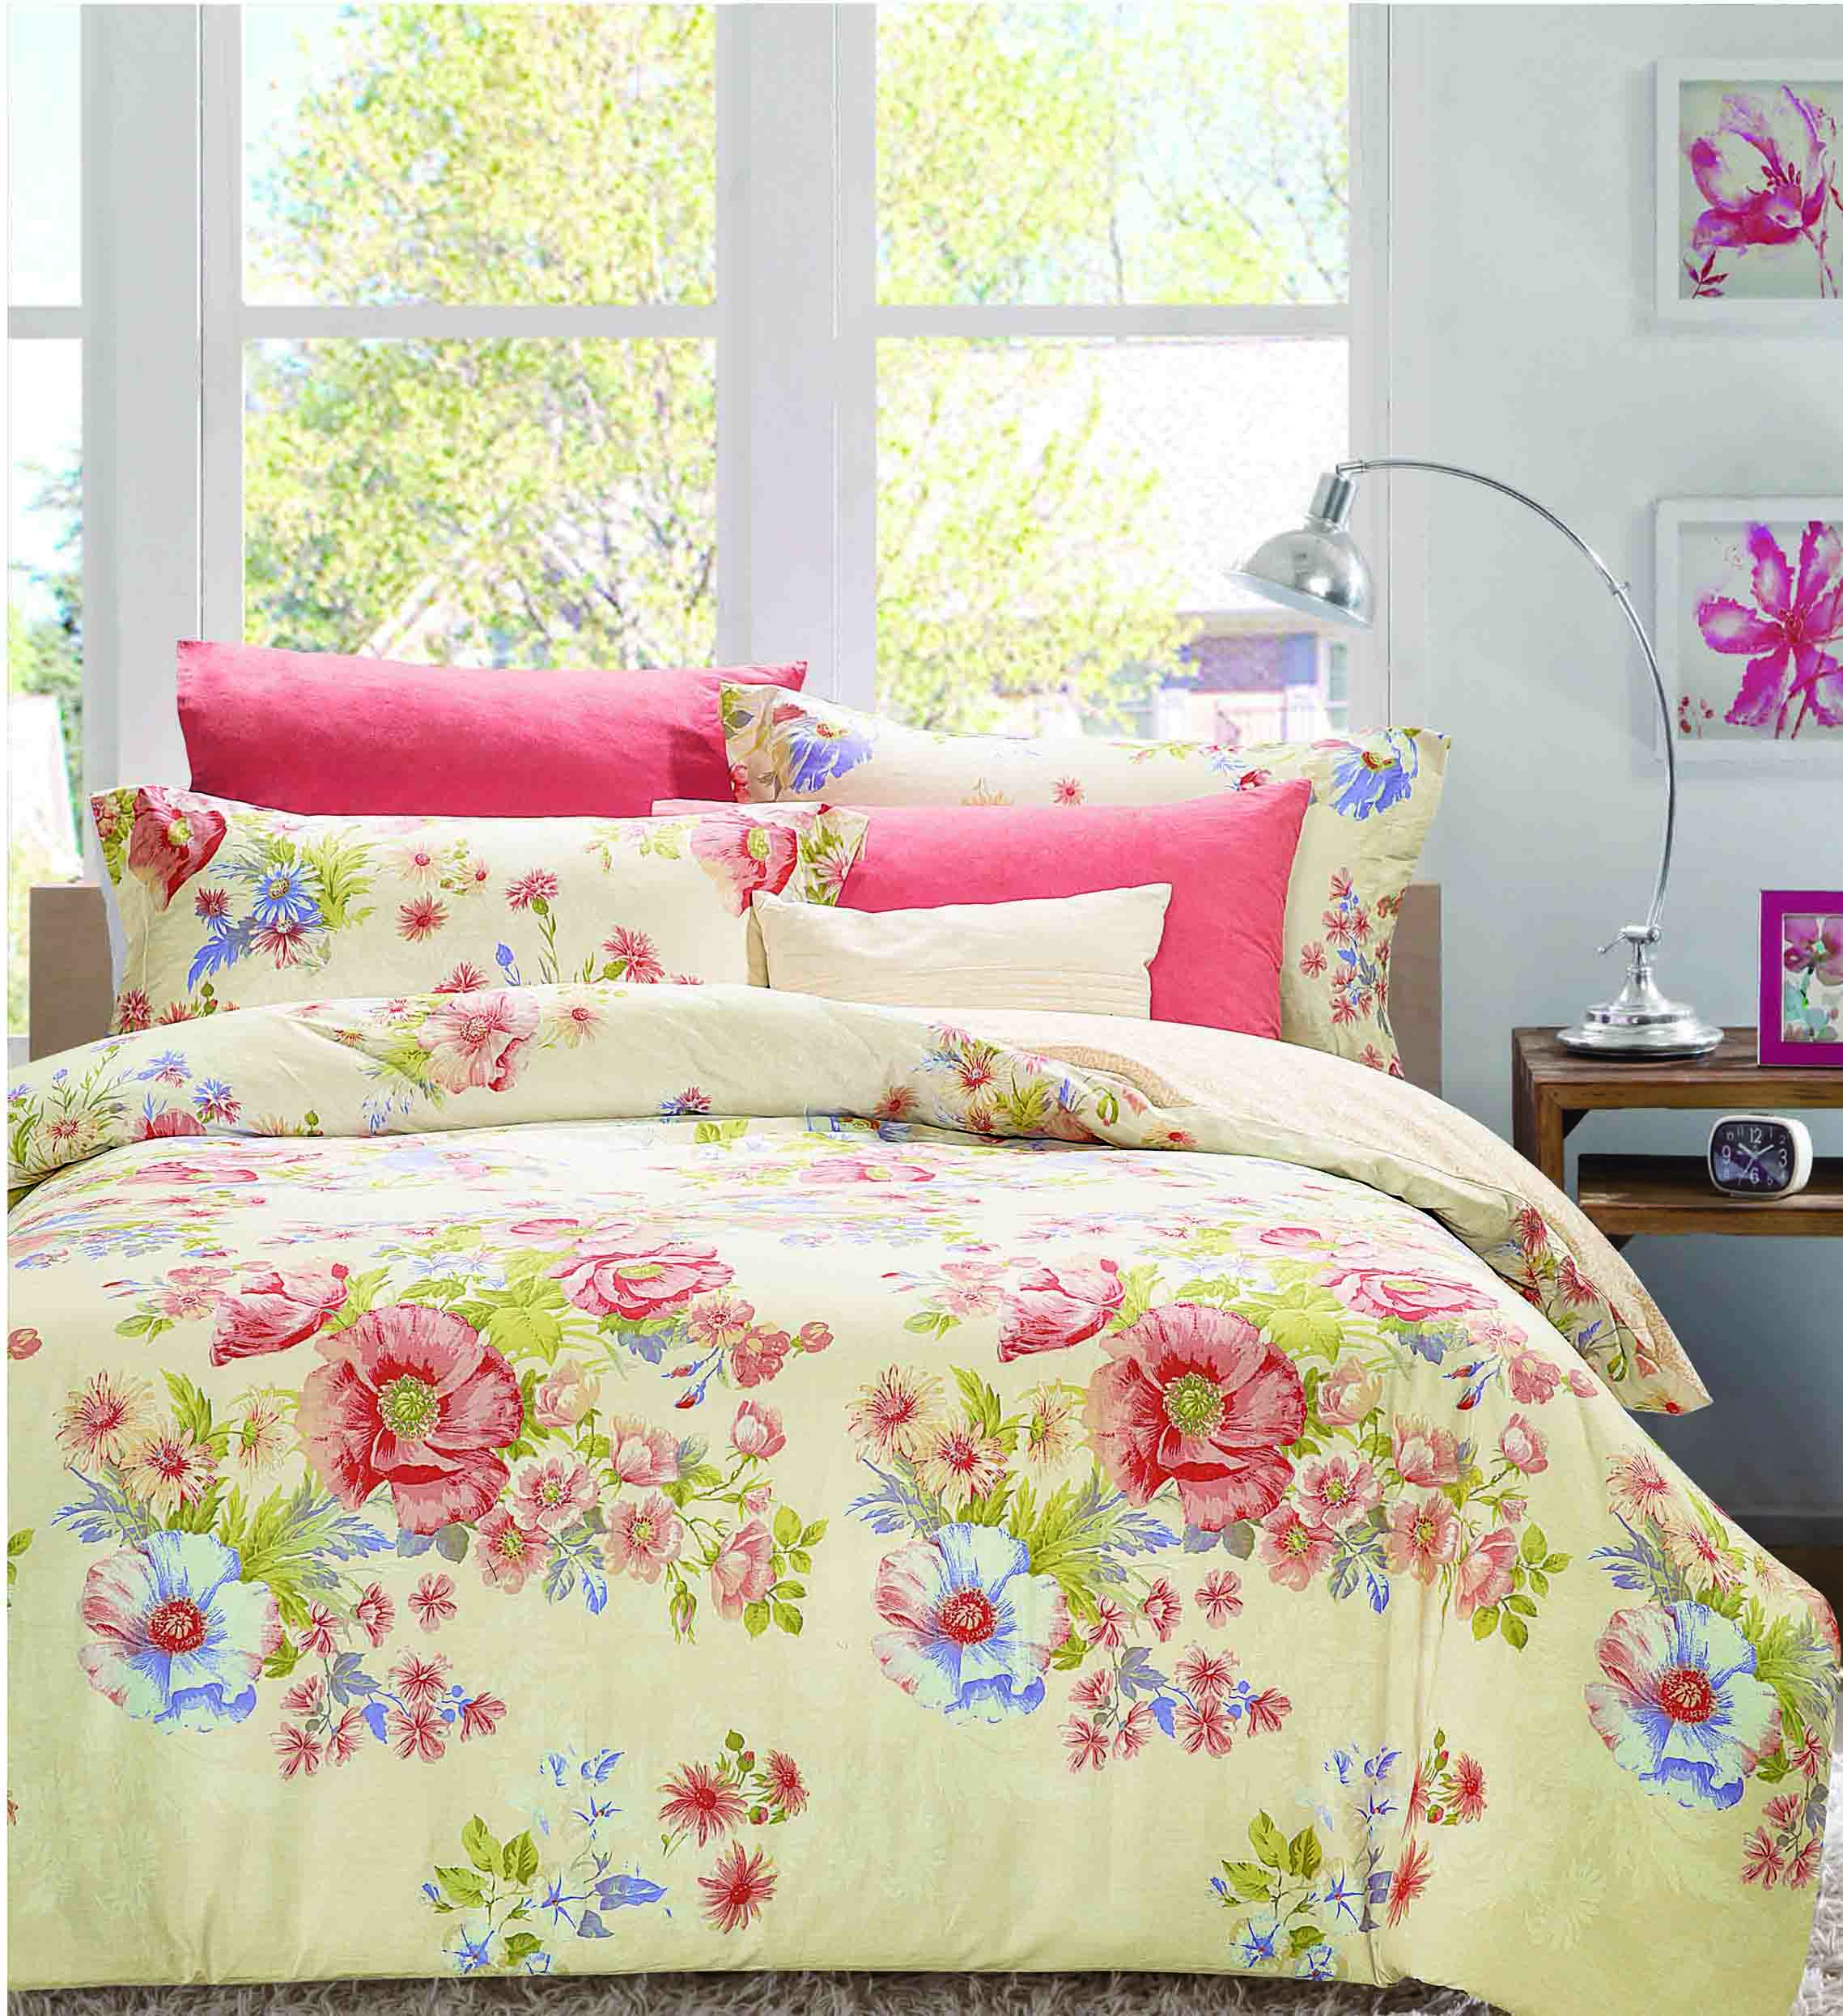 Hot 100 cotton bedding sets blossom lovely bedding Daphne Brand